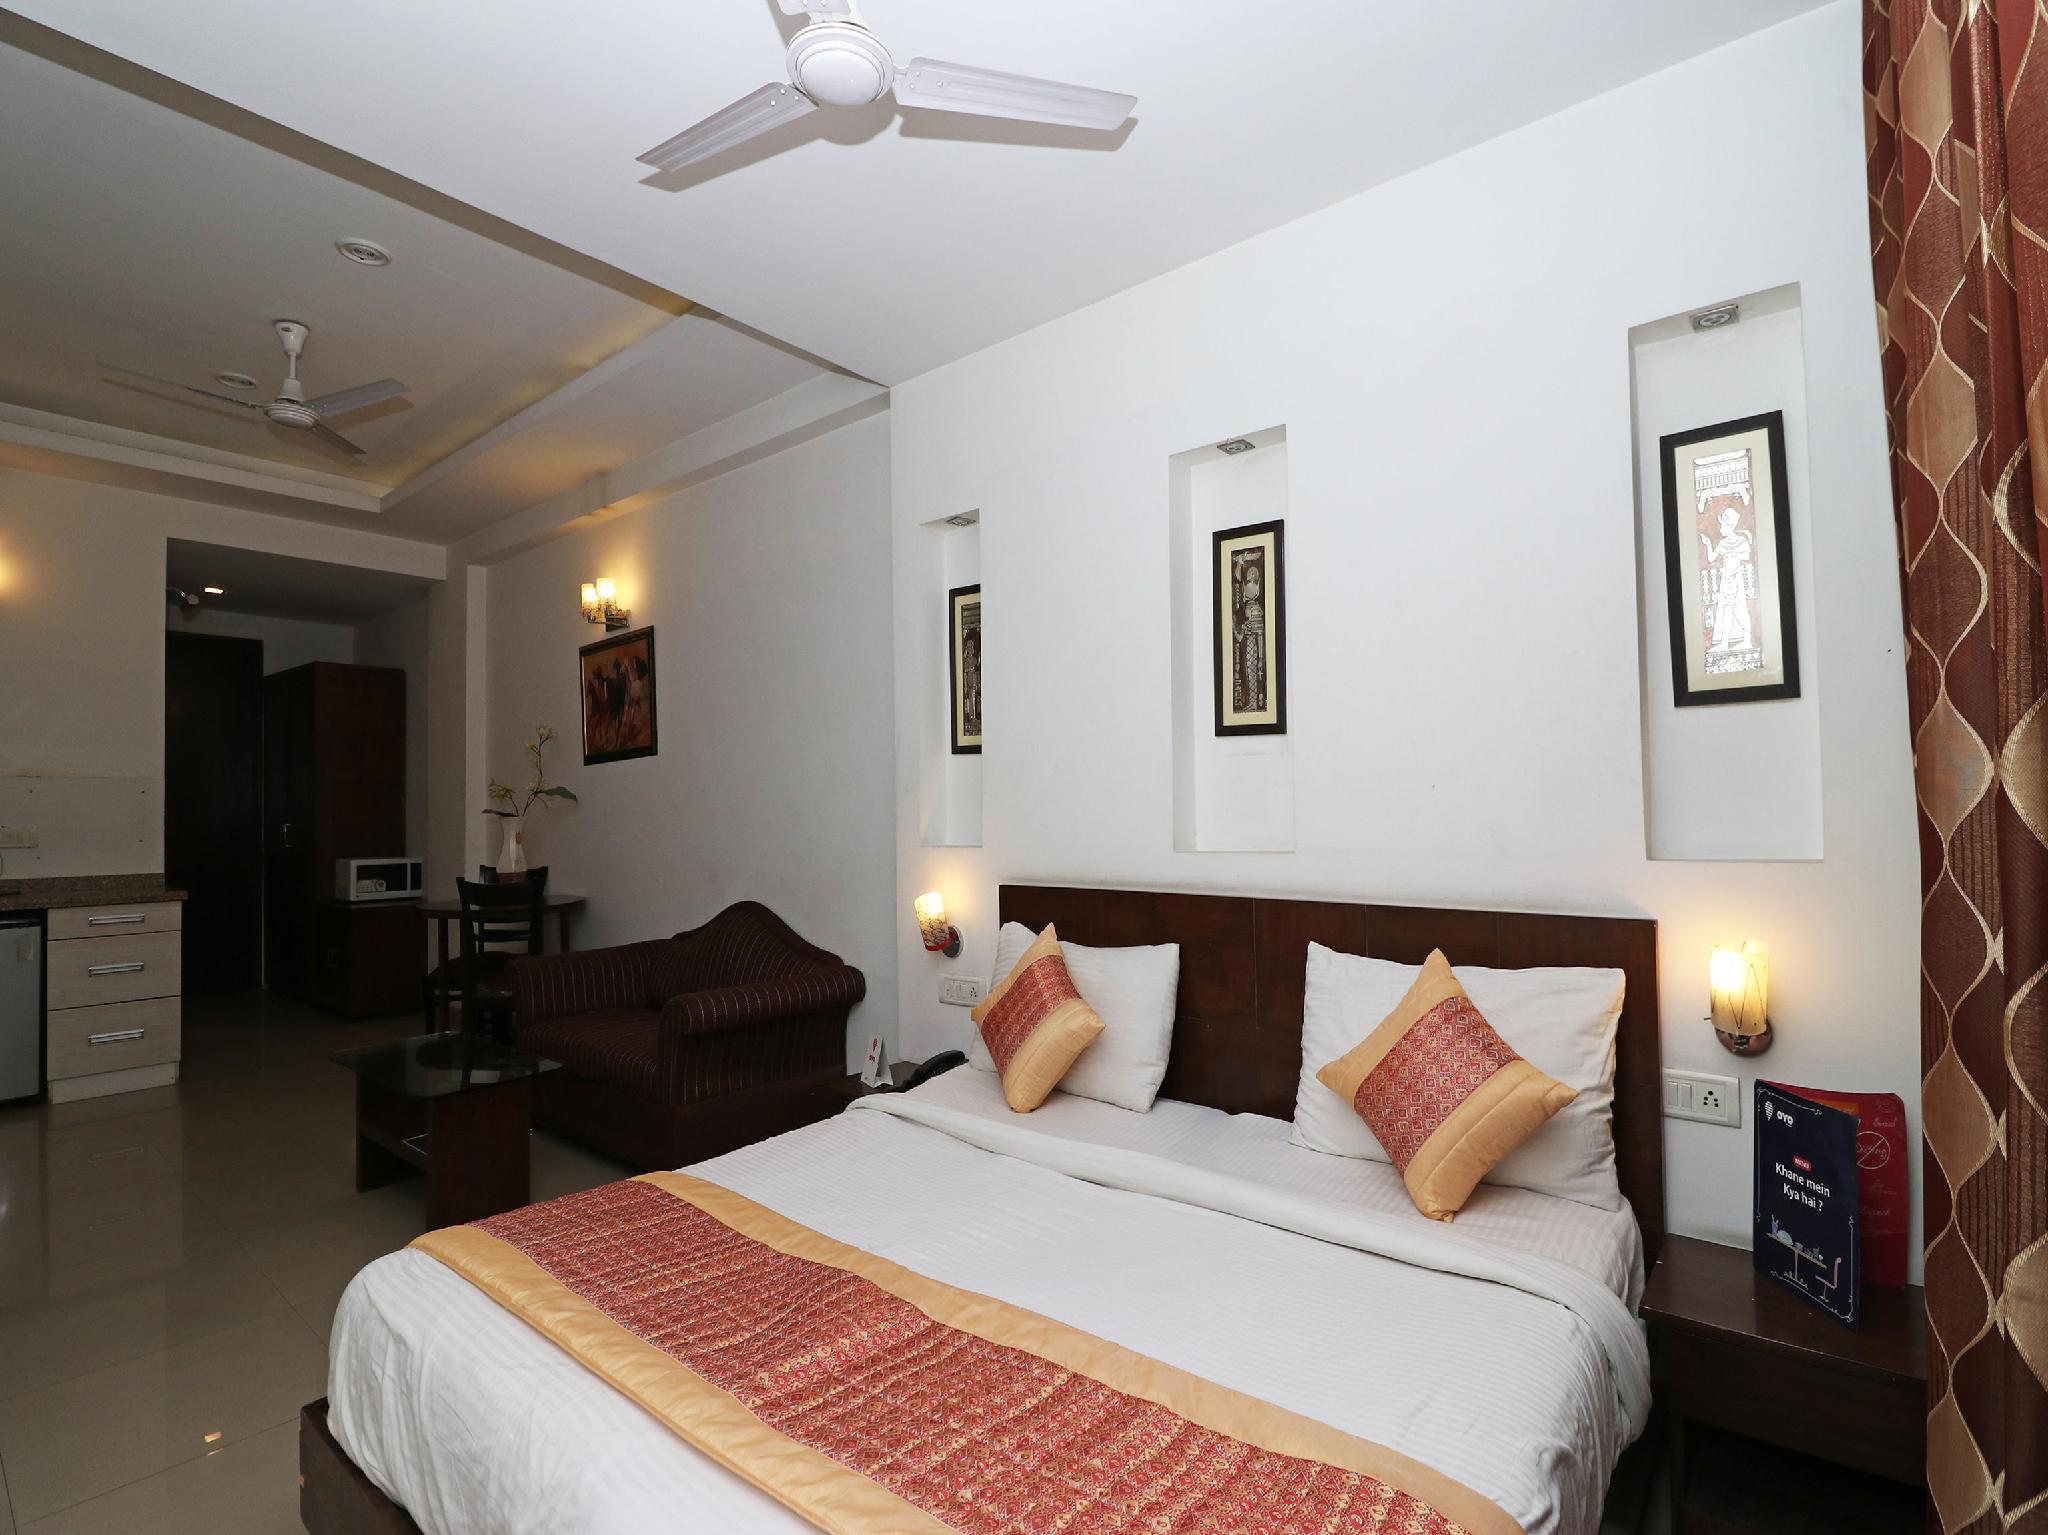 OYO 301 Hotel Mulberry Retreat